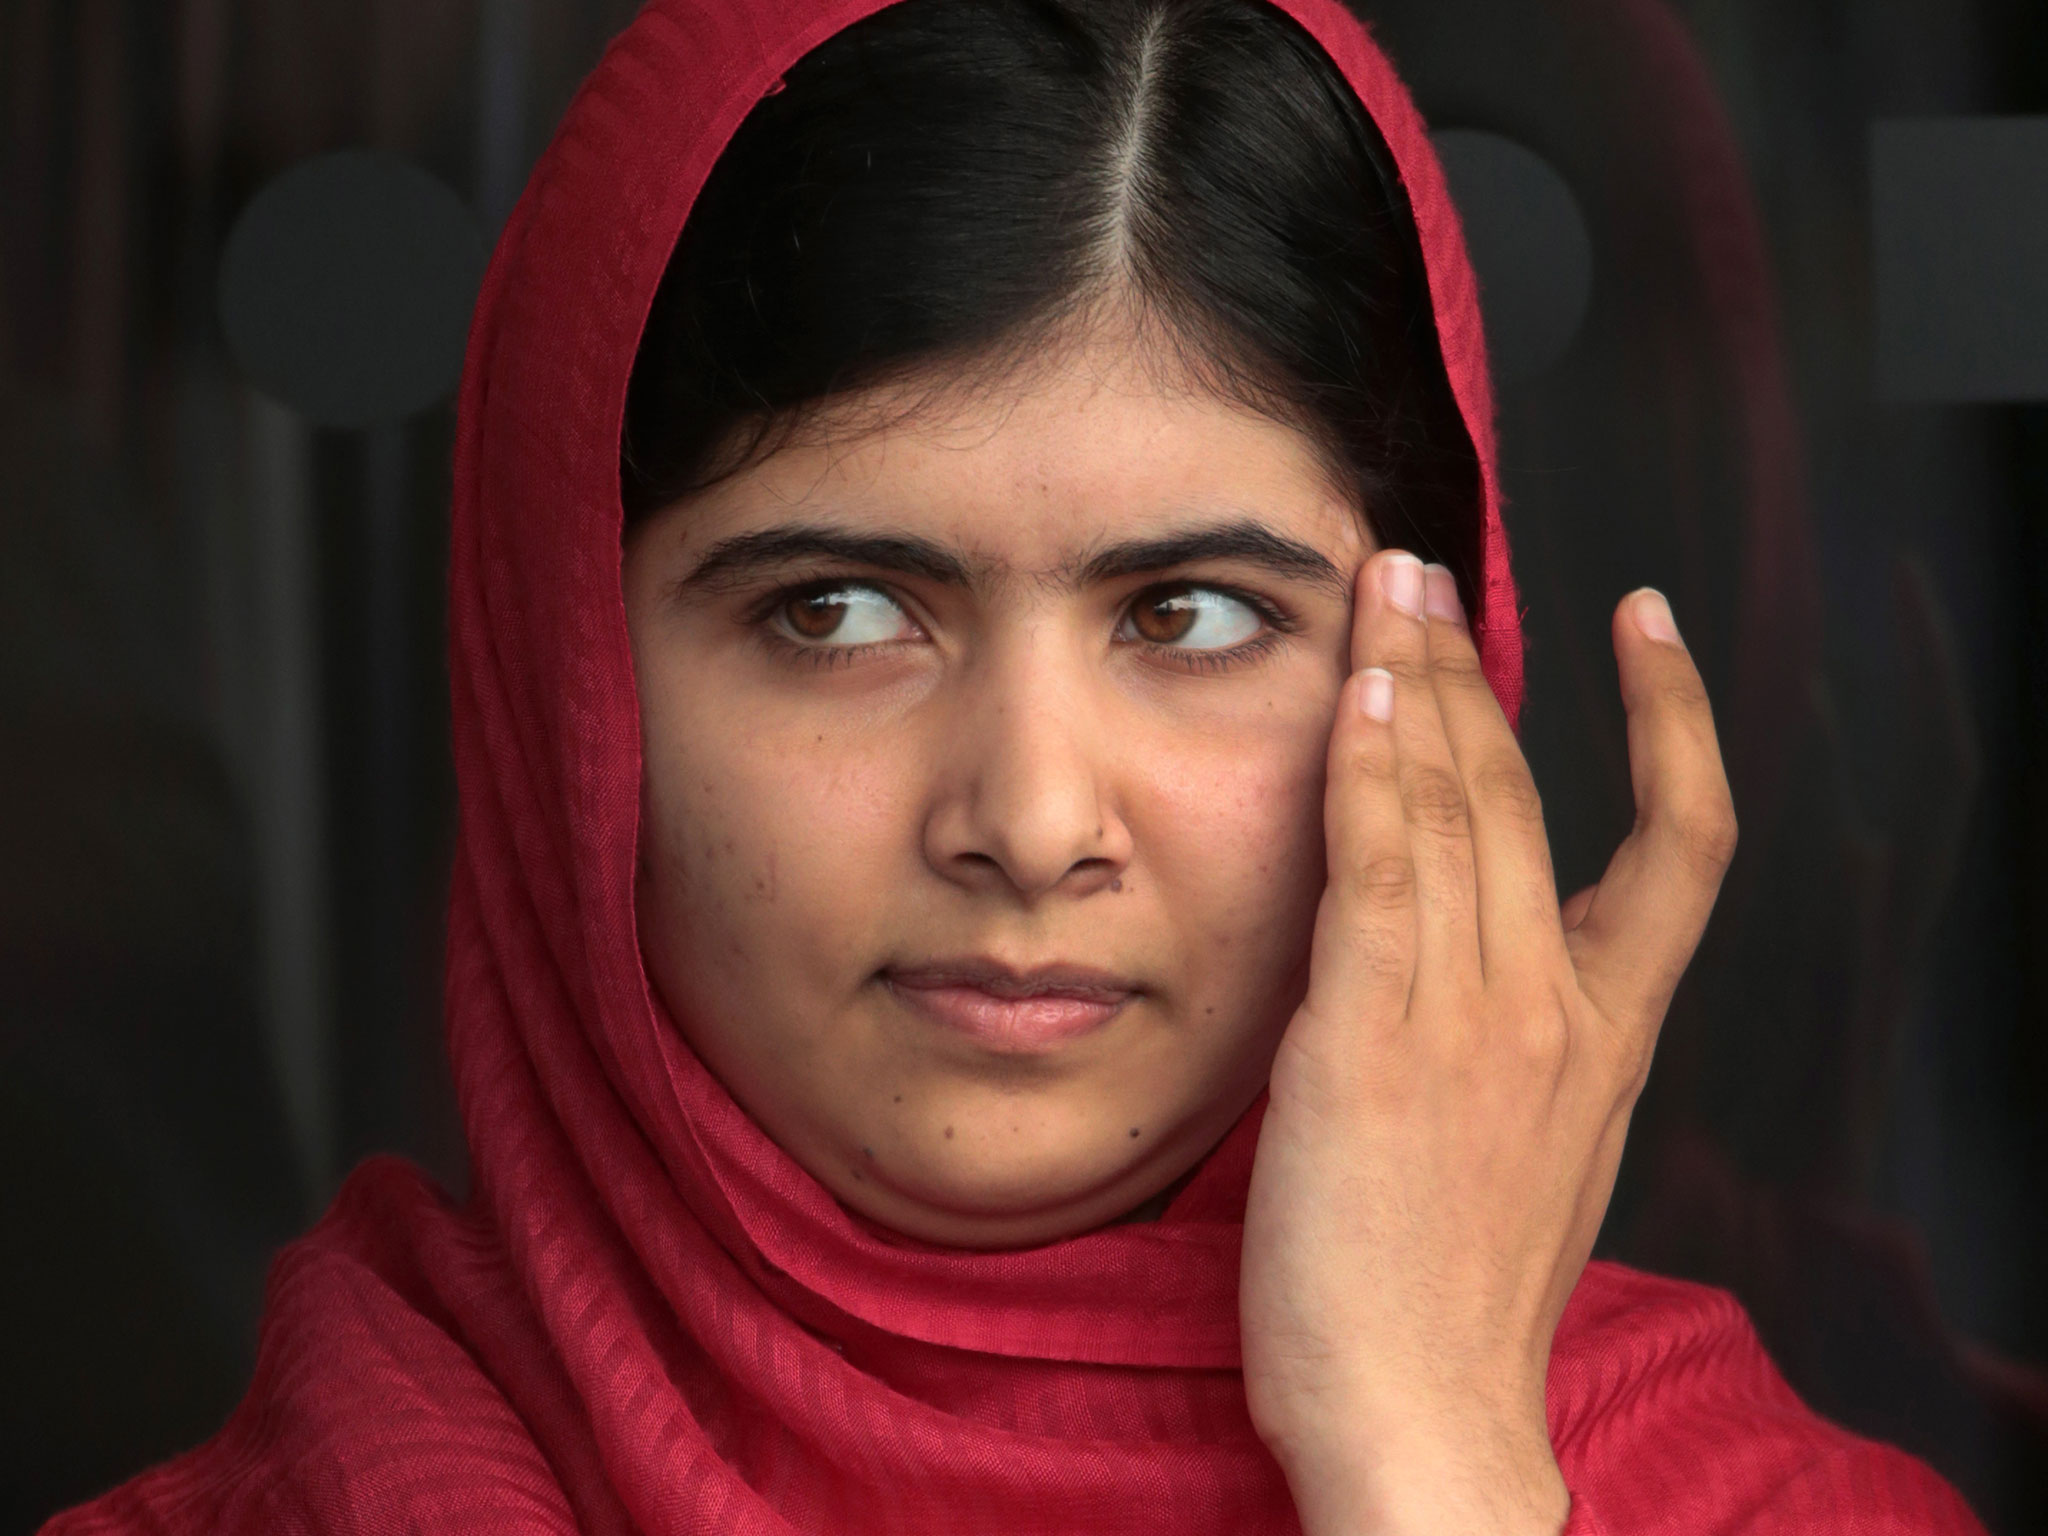 Malala Yousafzai Wallpaper 7   2048 X 1536 stmednet 2048x1536